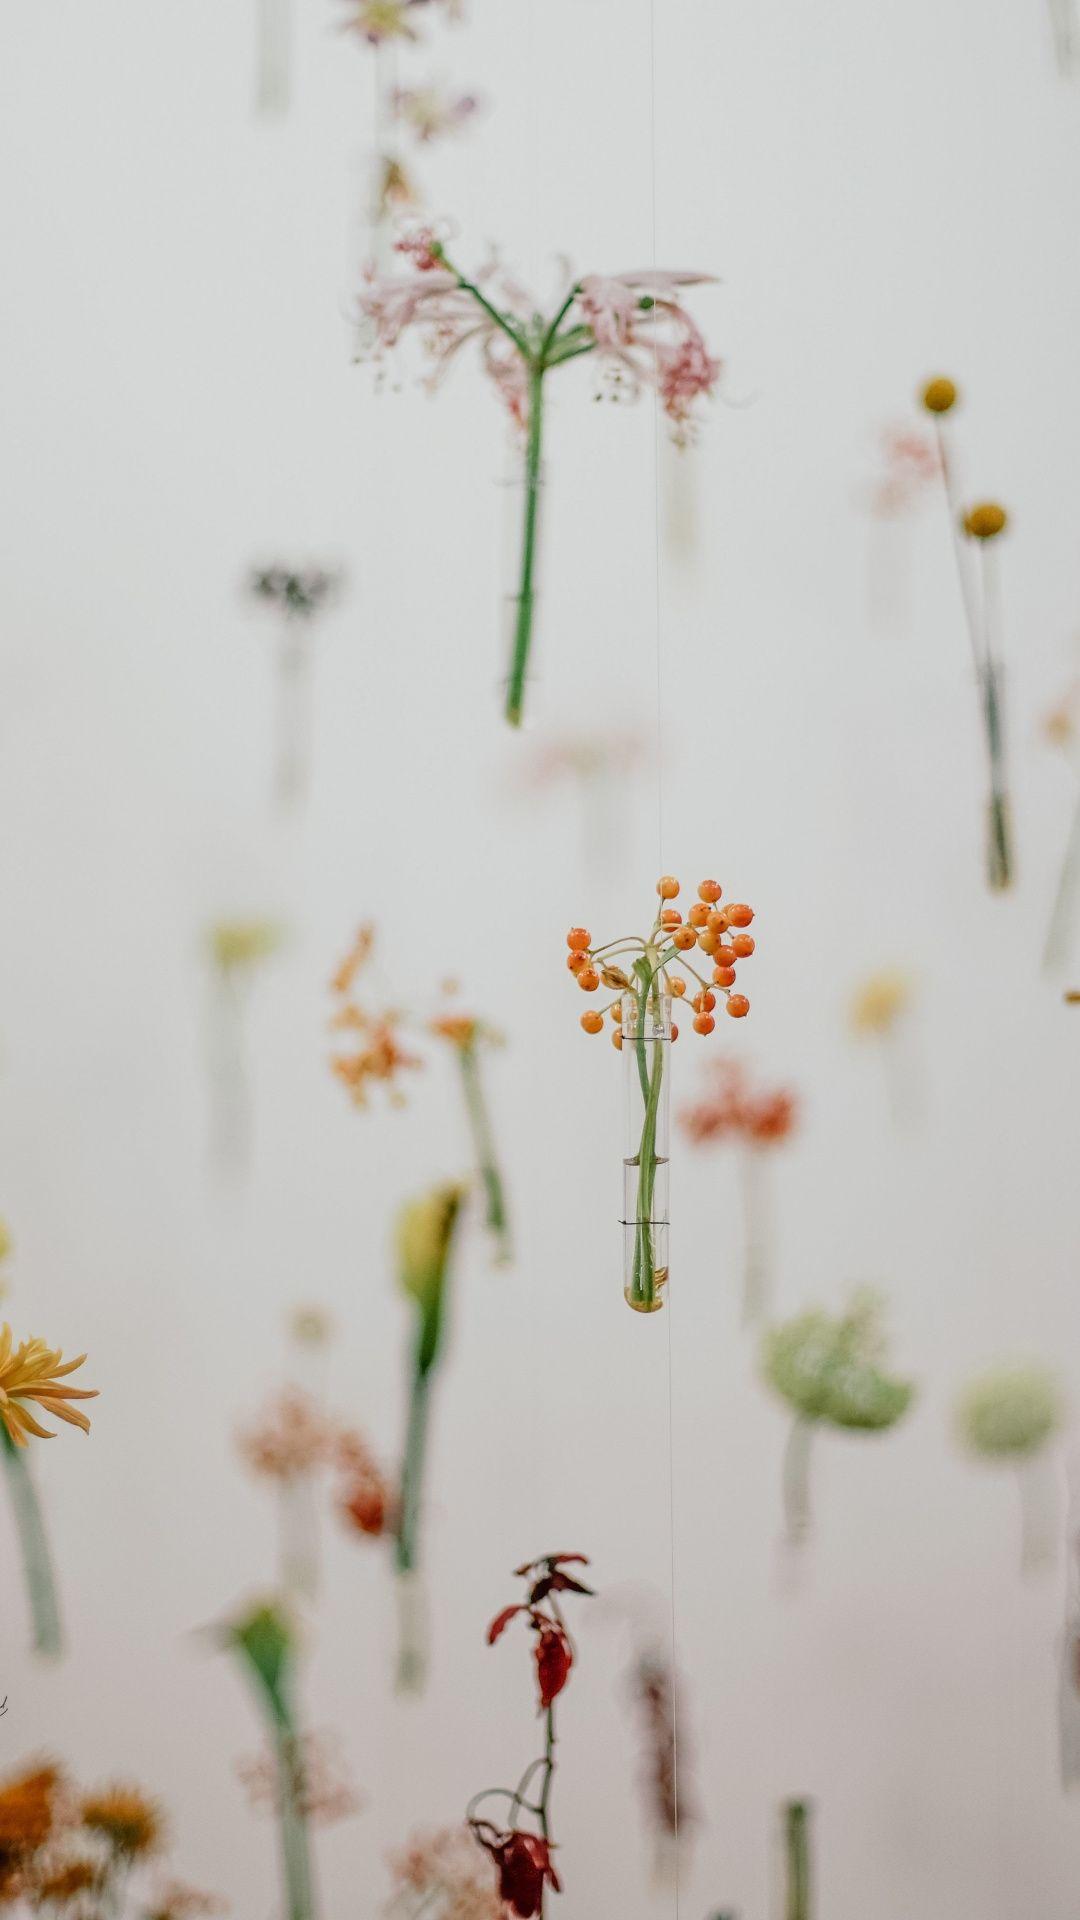 Minimal Hanging Flowers 1080x1920 Wallpaper Spring Wallpaper Iphone Wallpaper Tumblr Aesthetic Flower Wallpaper